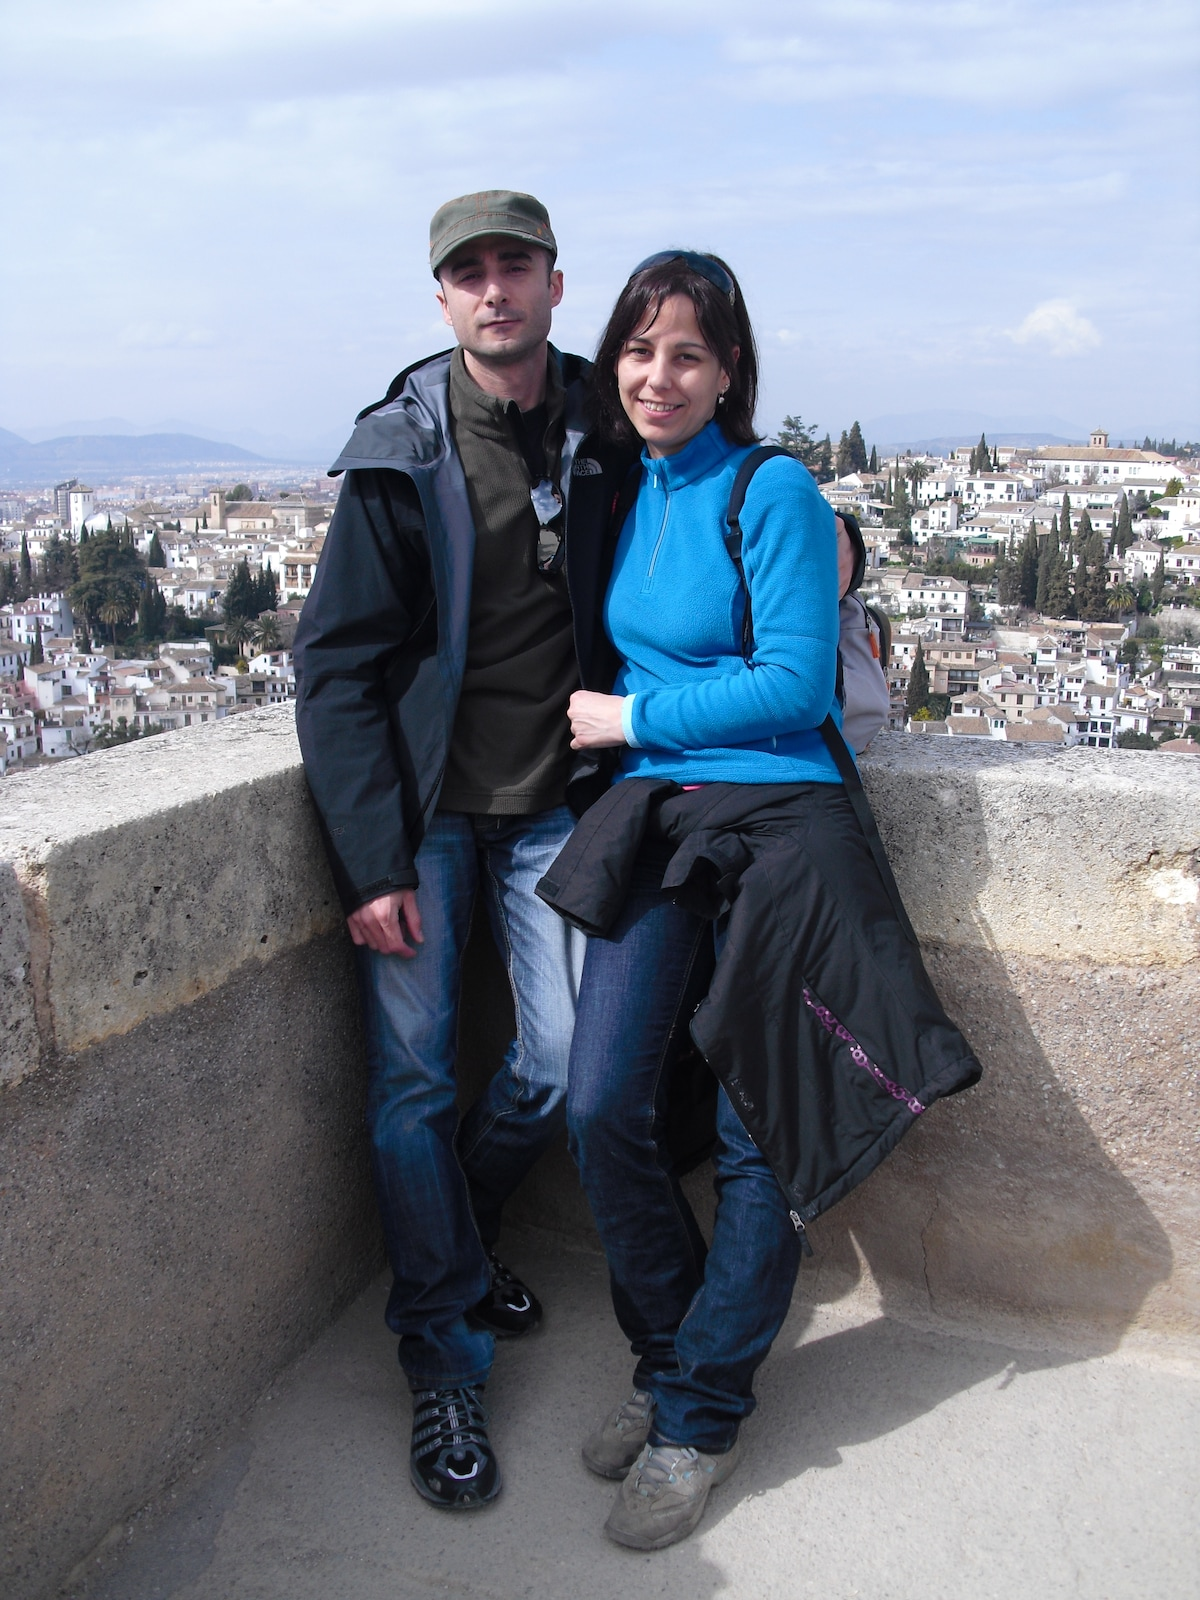 Manuel Y Patricia from Madrid